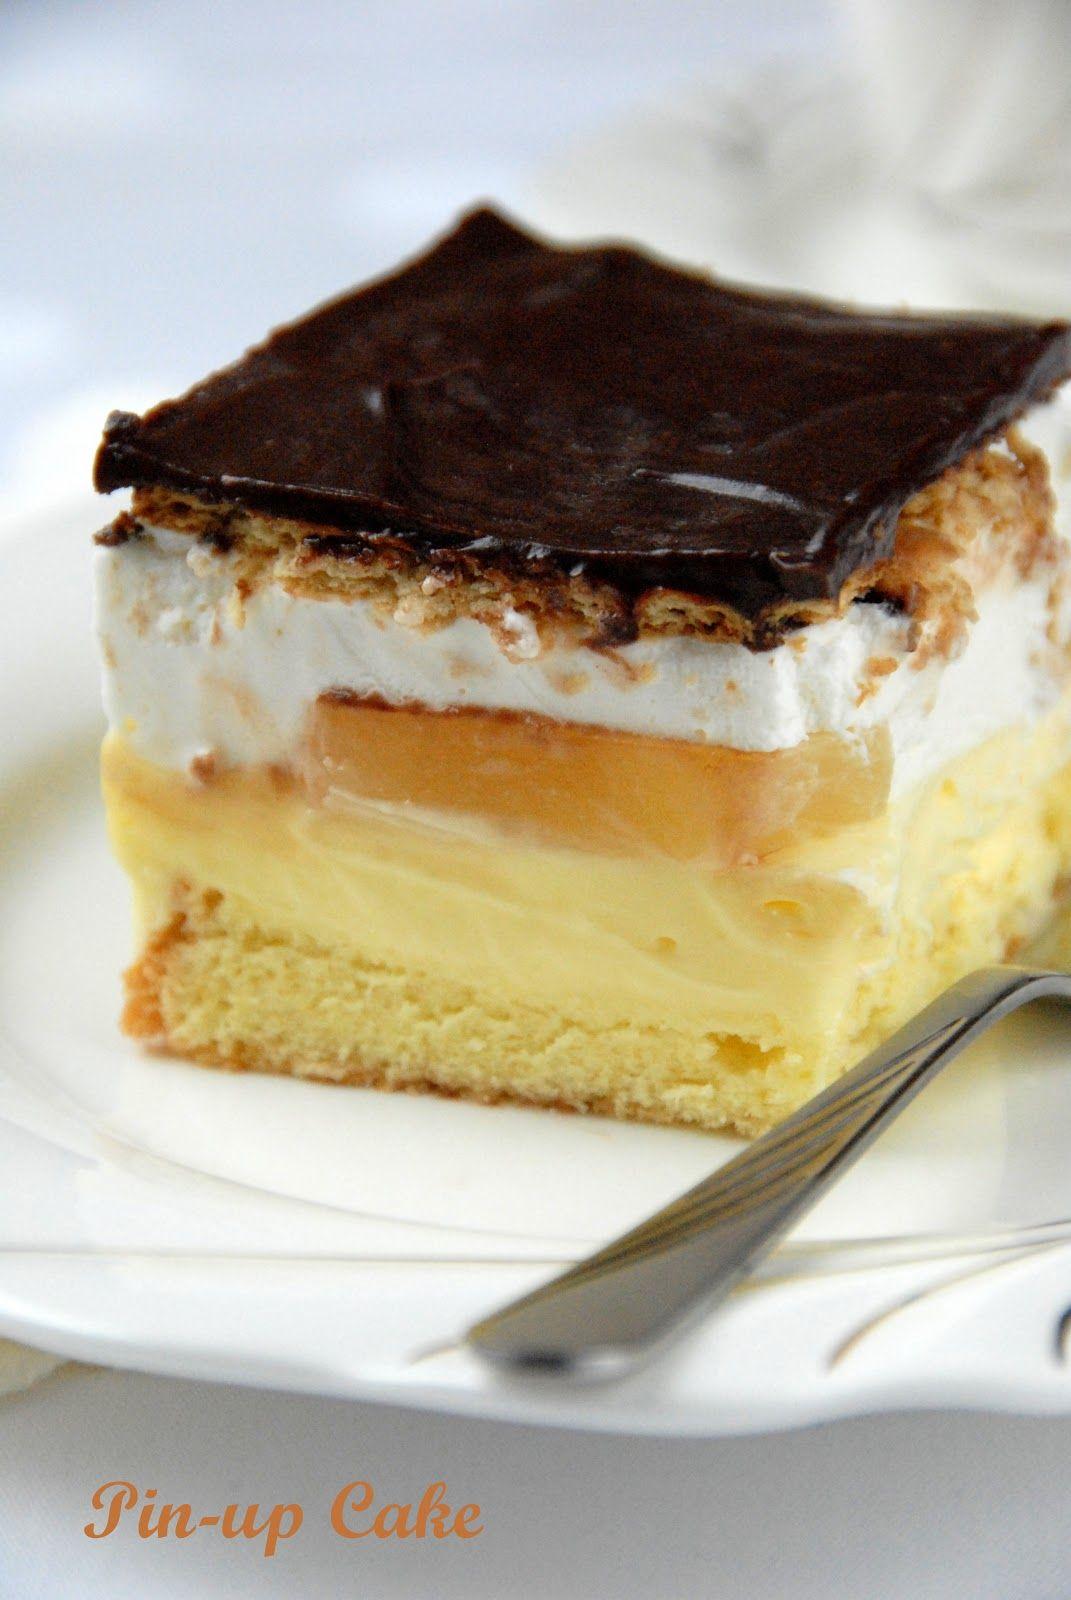 Up Cake Cytrynowiec Wg Siostry Anastazji Culinary Recipes Dessert Recipes Sweet Recipes